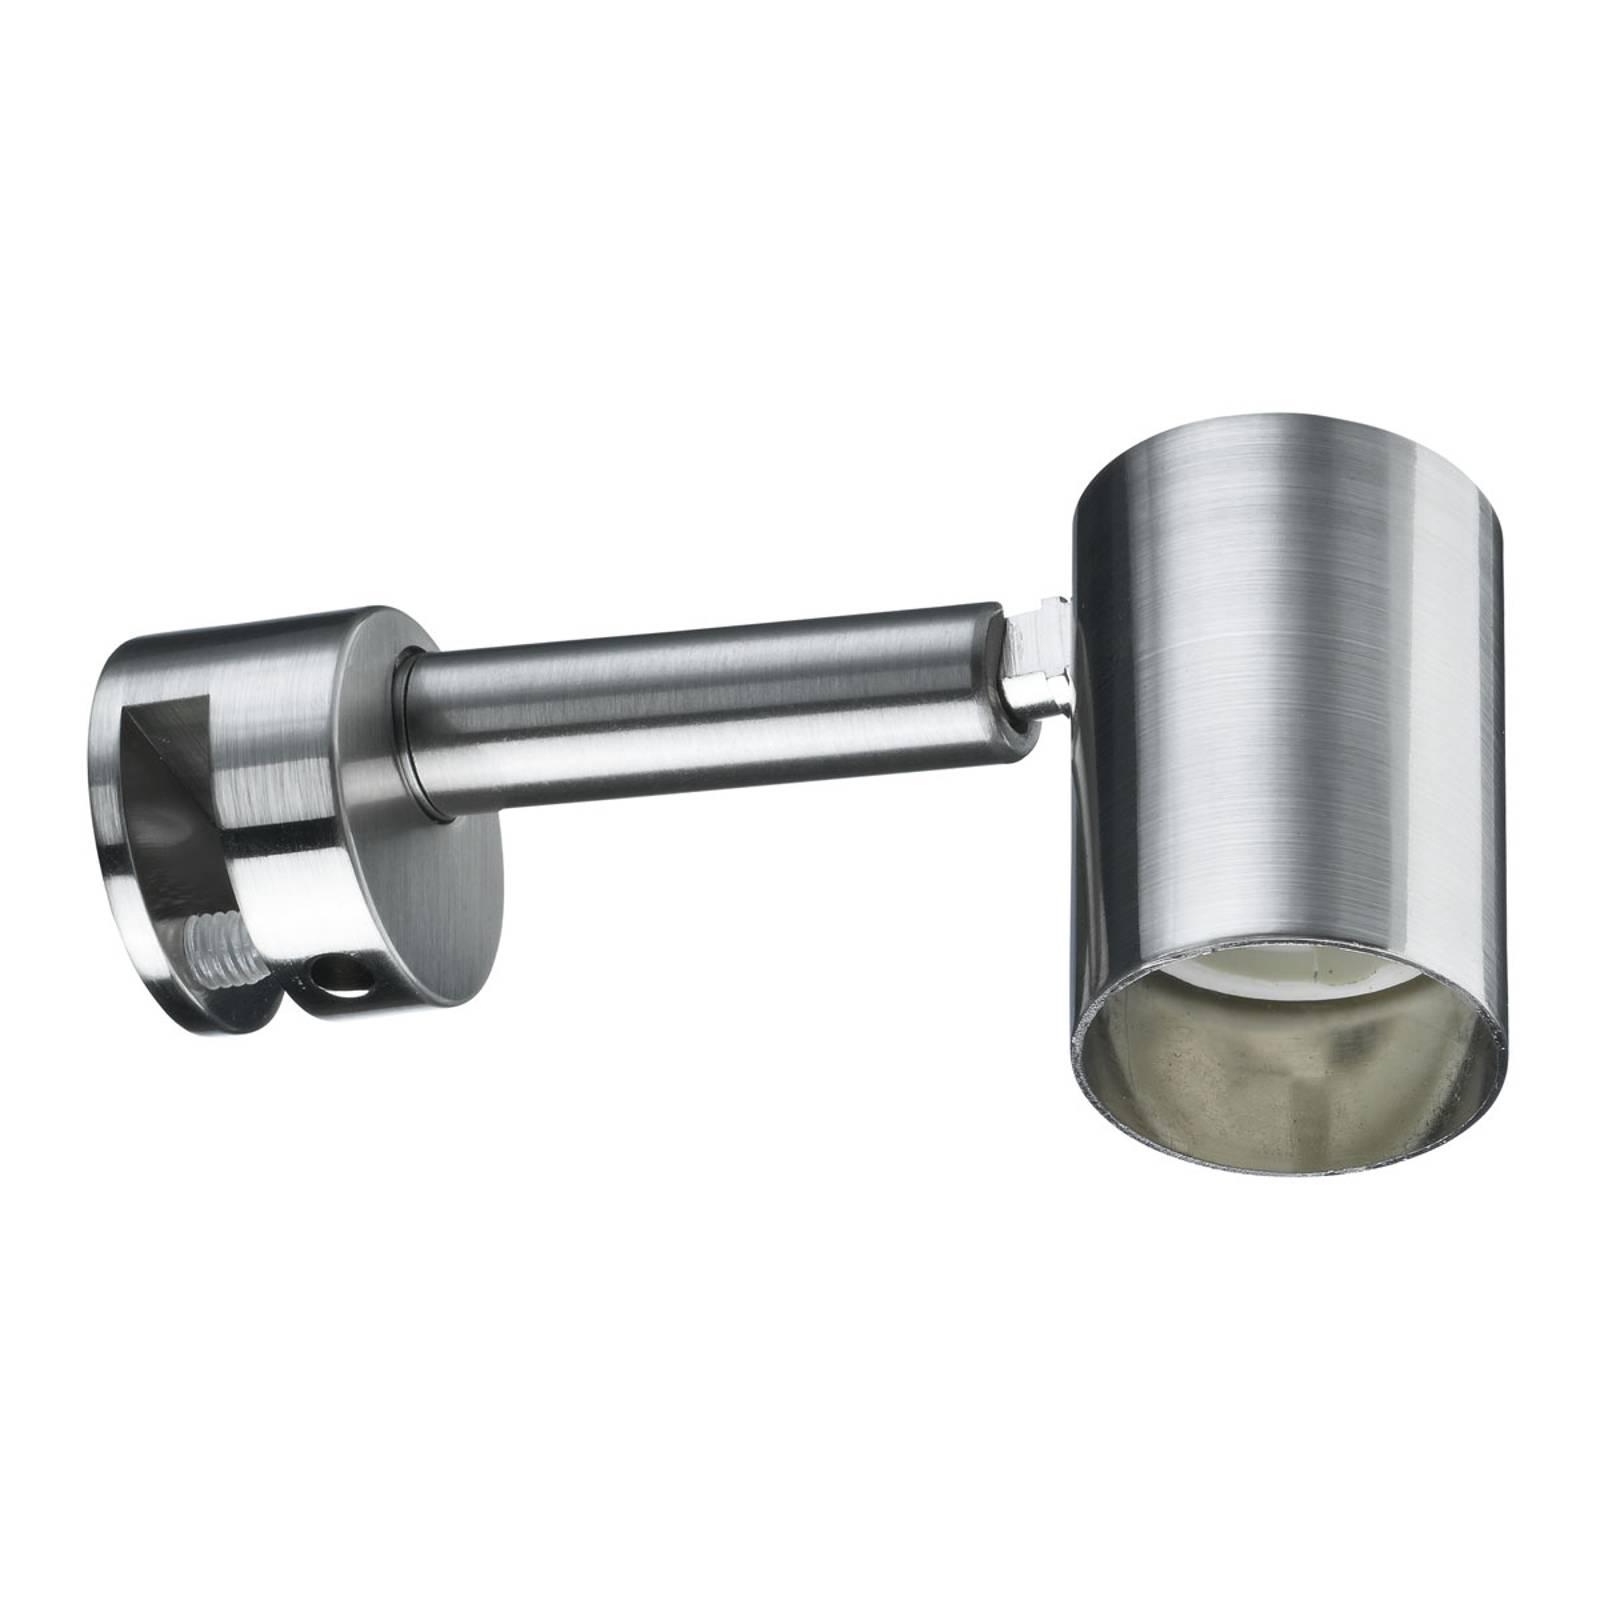 Paulmann Simplo LED-peililamppu